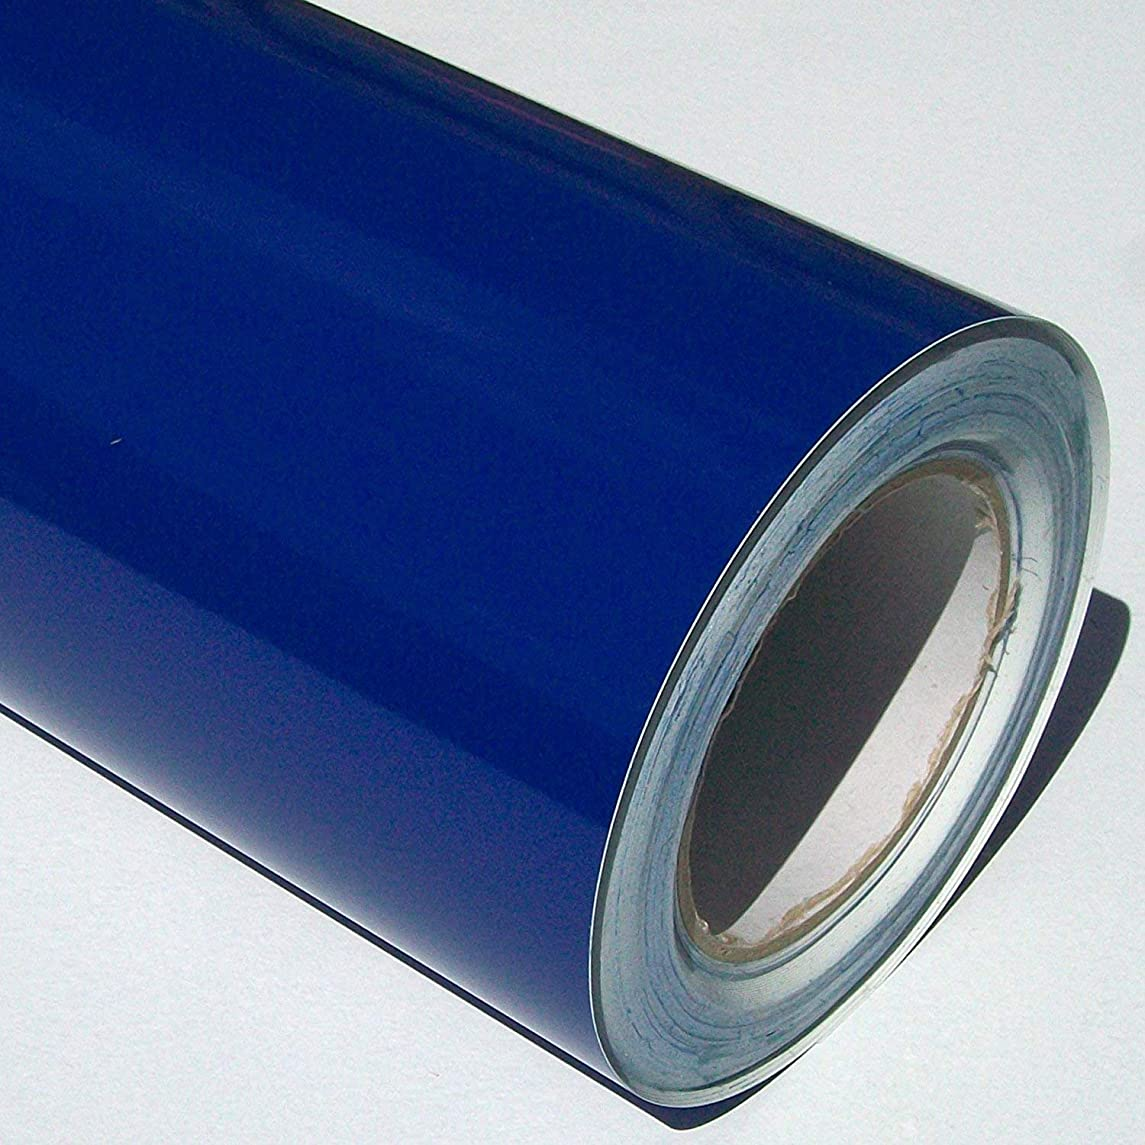 Blue Self Adhesive Vinyl 24in x 30 feet